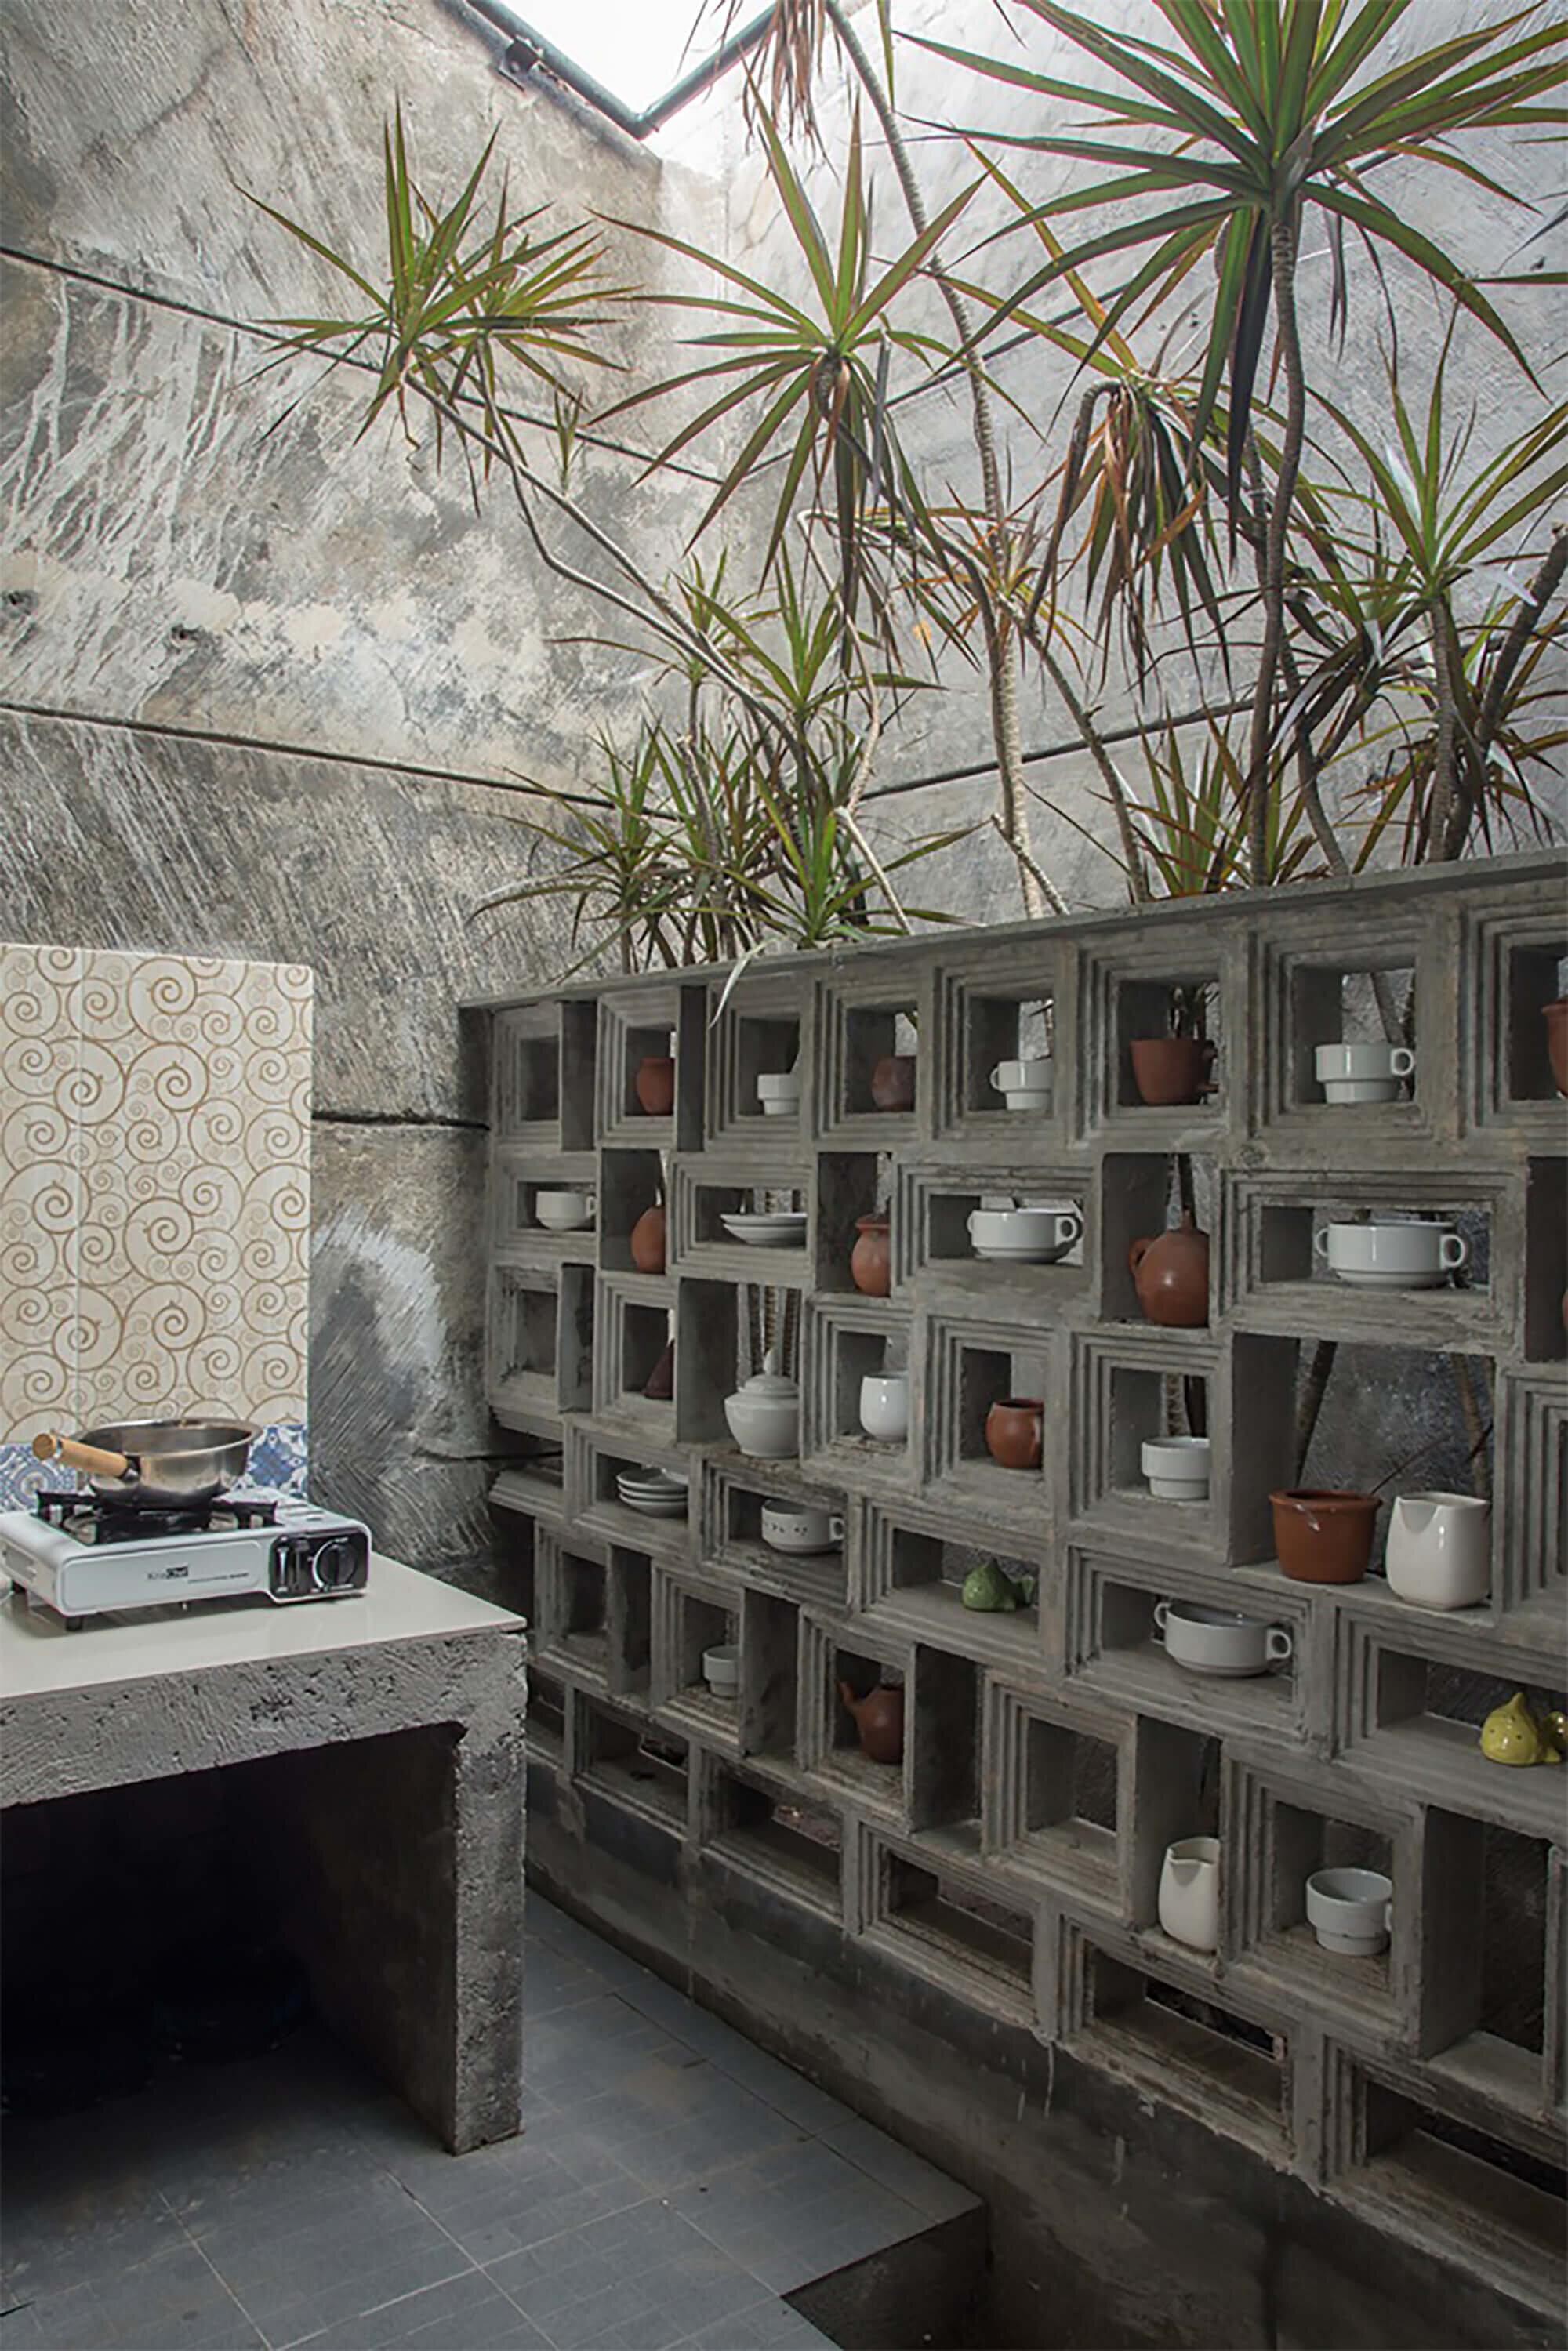 The-Obsolete-House-Omah-Amoh-Gayuh-Budi-Utomo-Indonesia-29